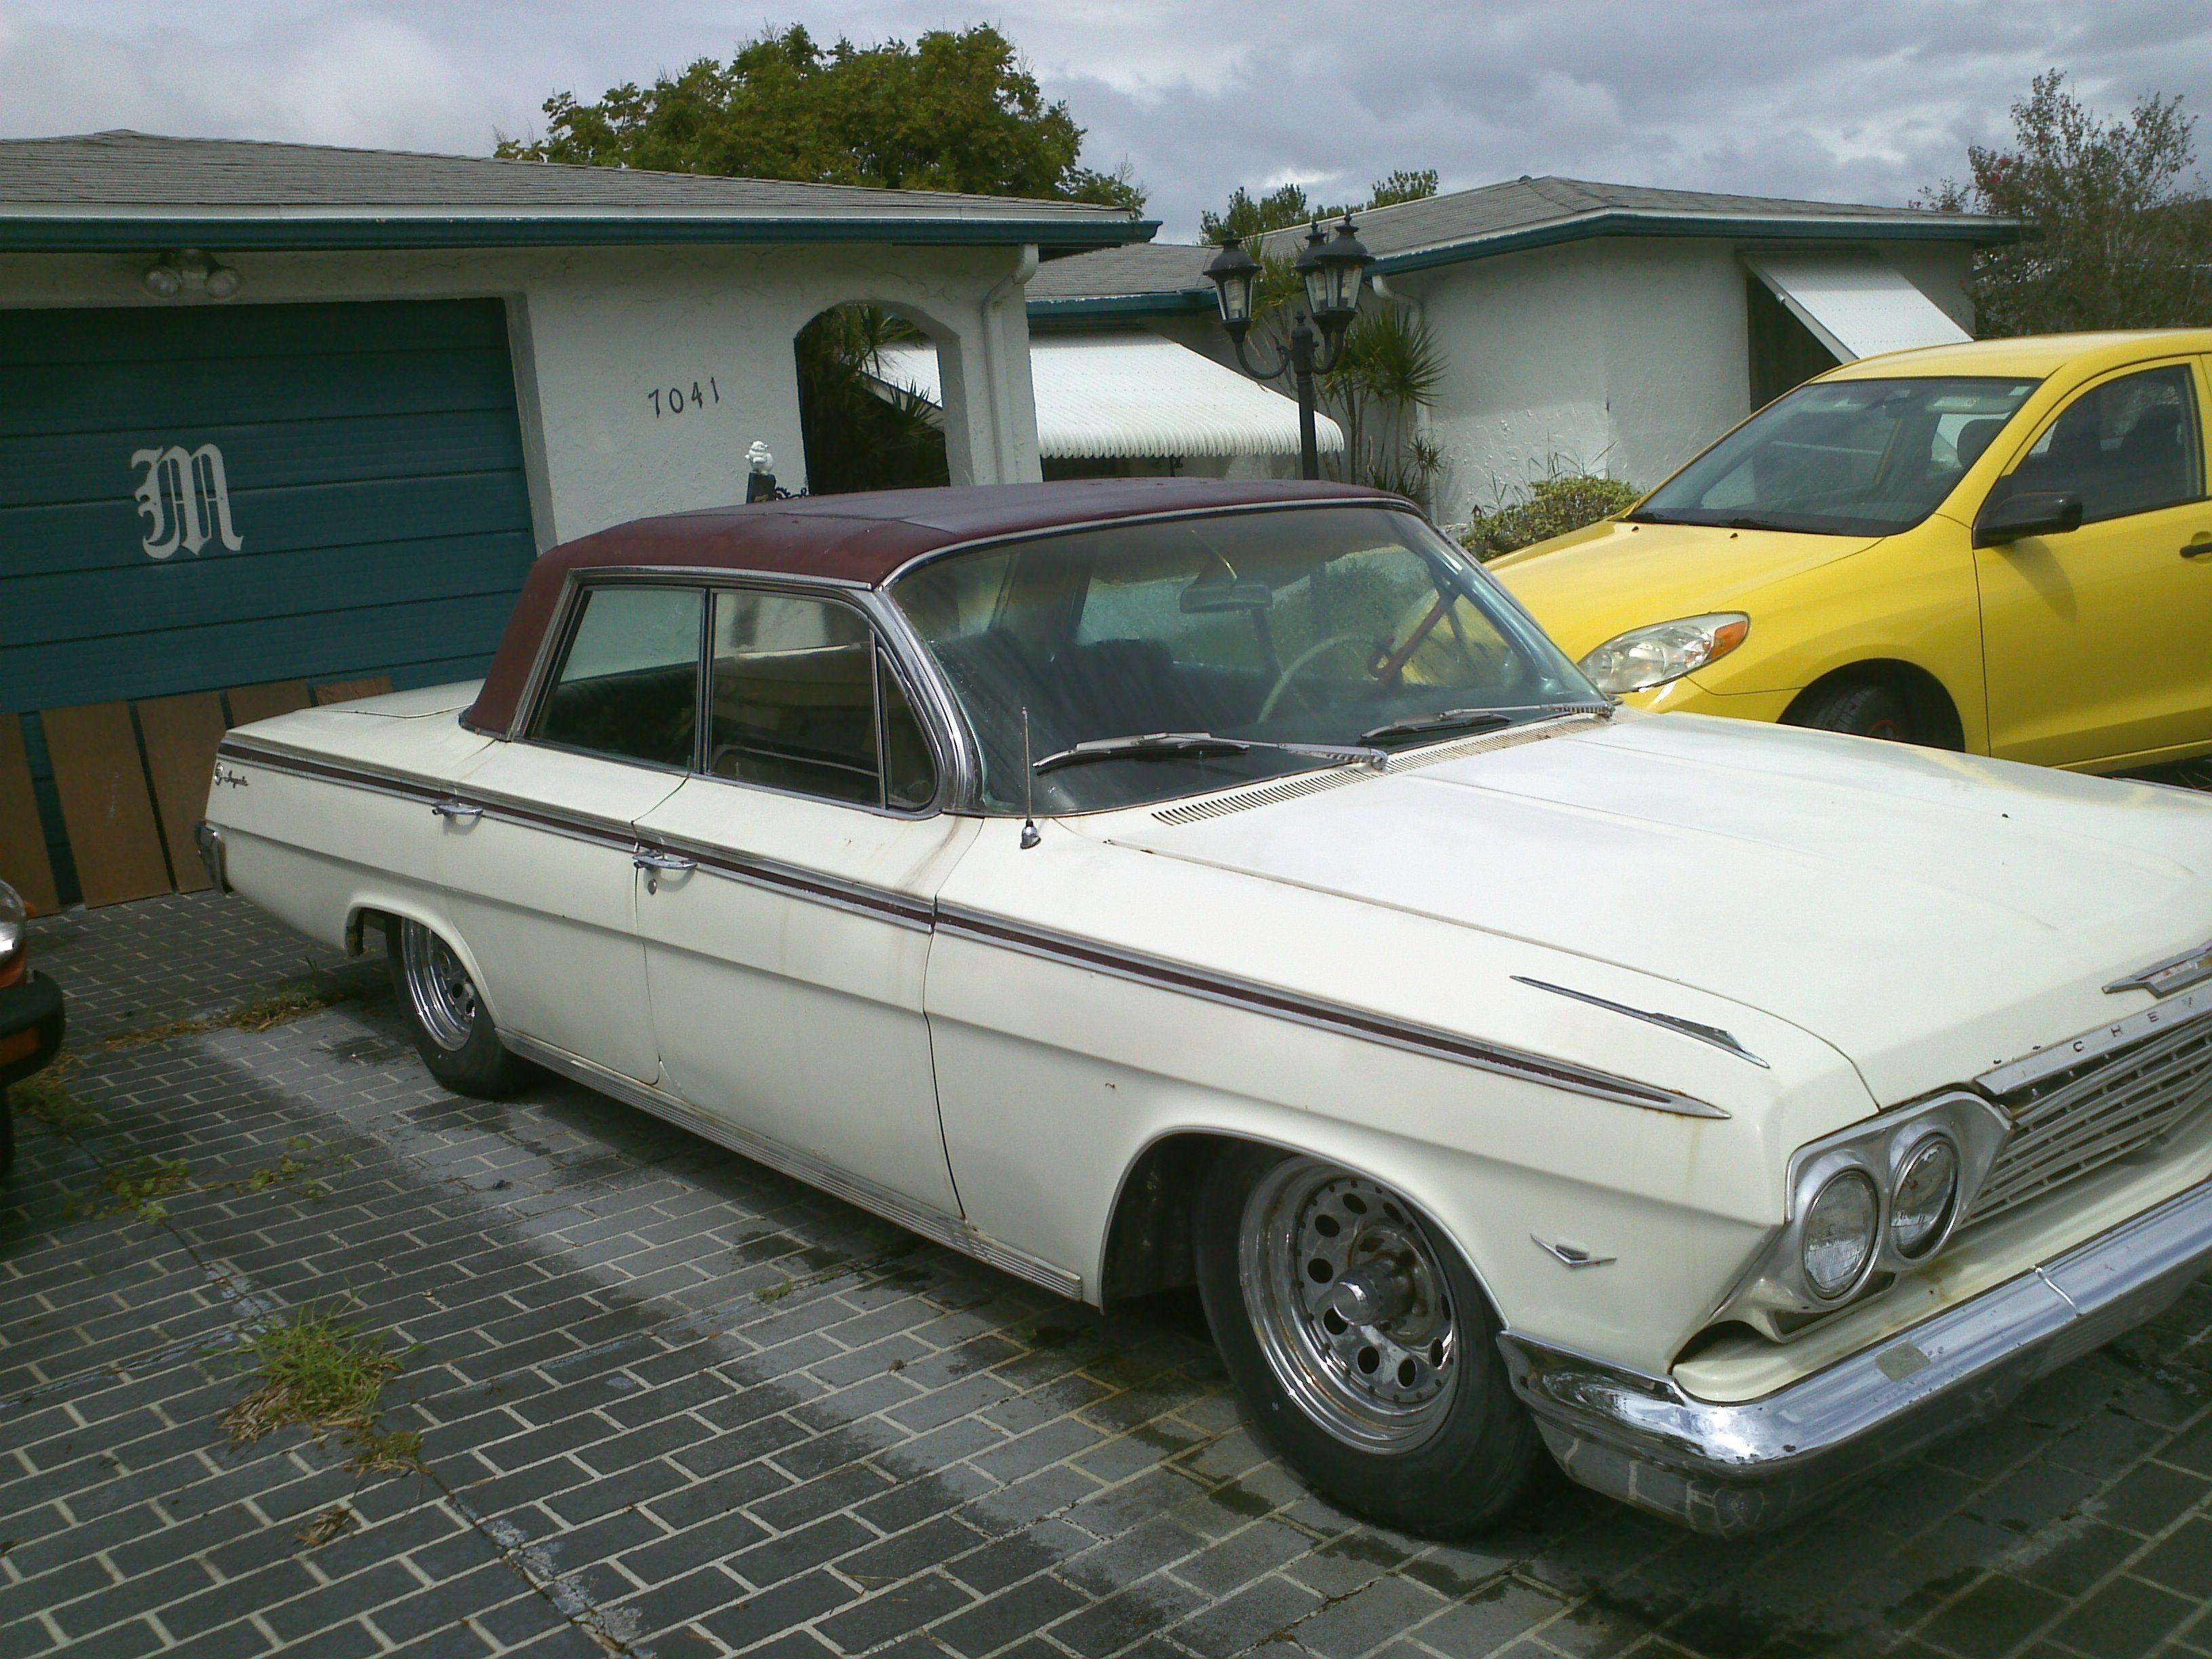 62 Chevy Impala 4 Dr Ratrod White With Maroon Vinyl Top 283 V8 With Power Glide Auto Transmisson 45599 Miles She Needs S Chevy Impala Impala Rat Rod